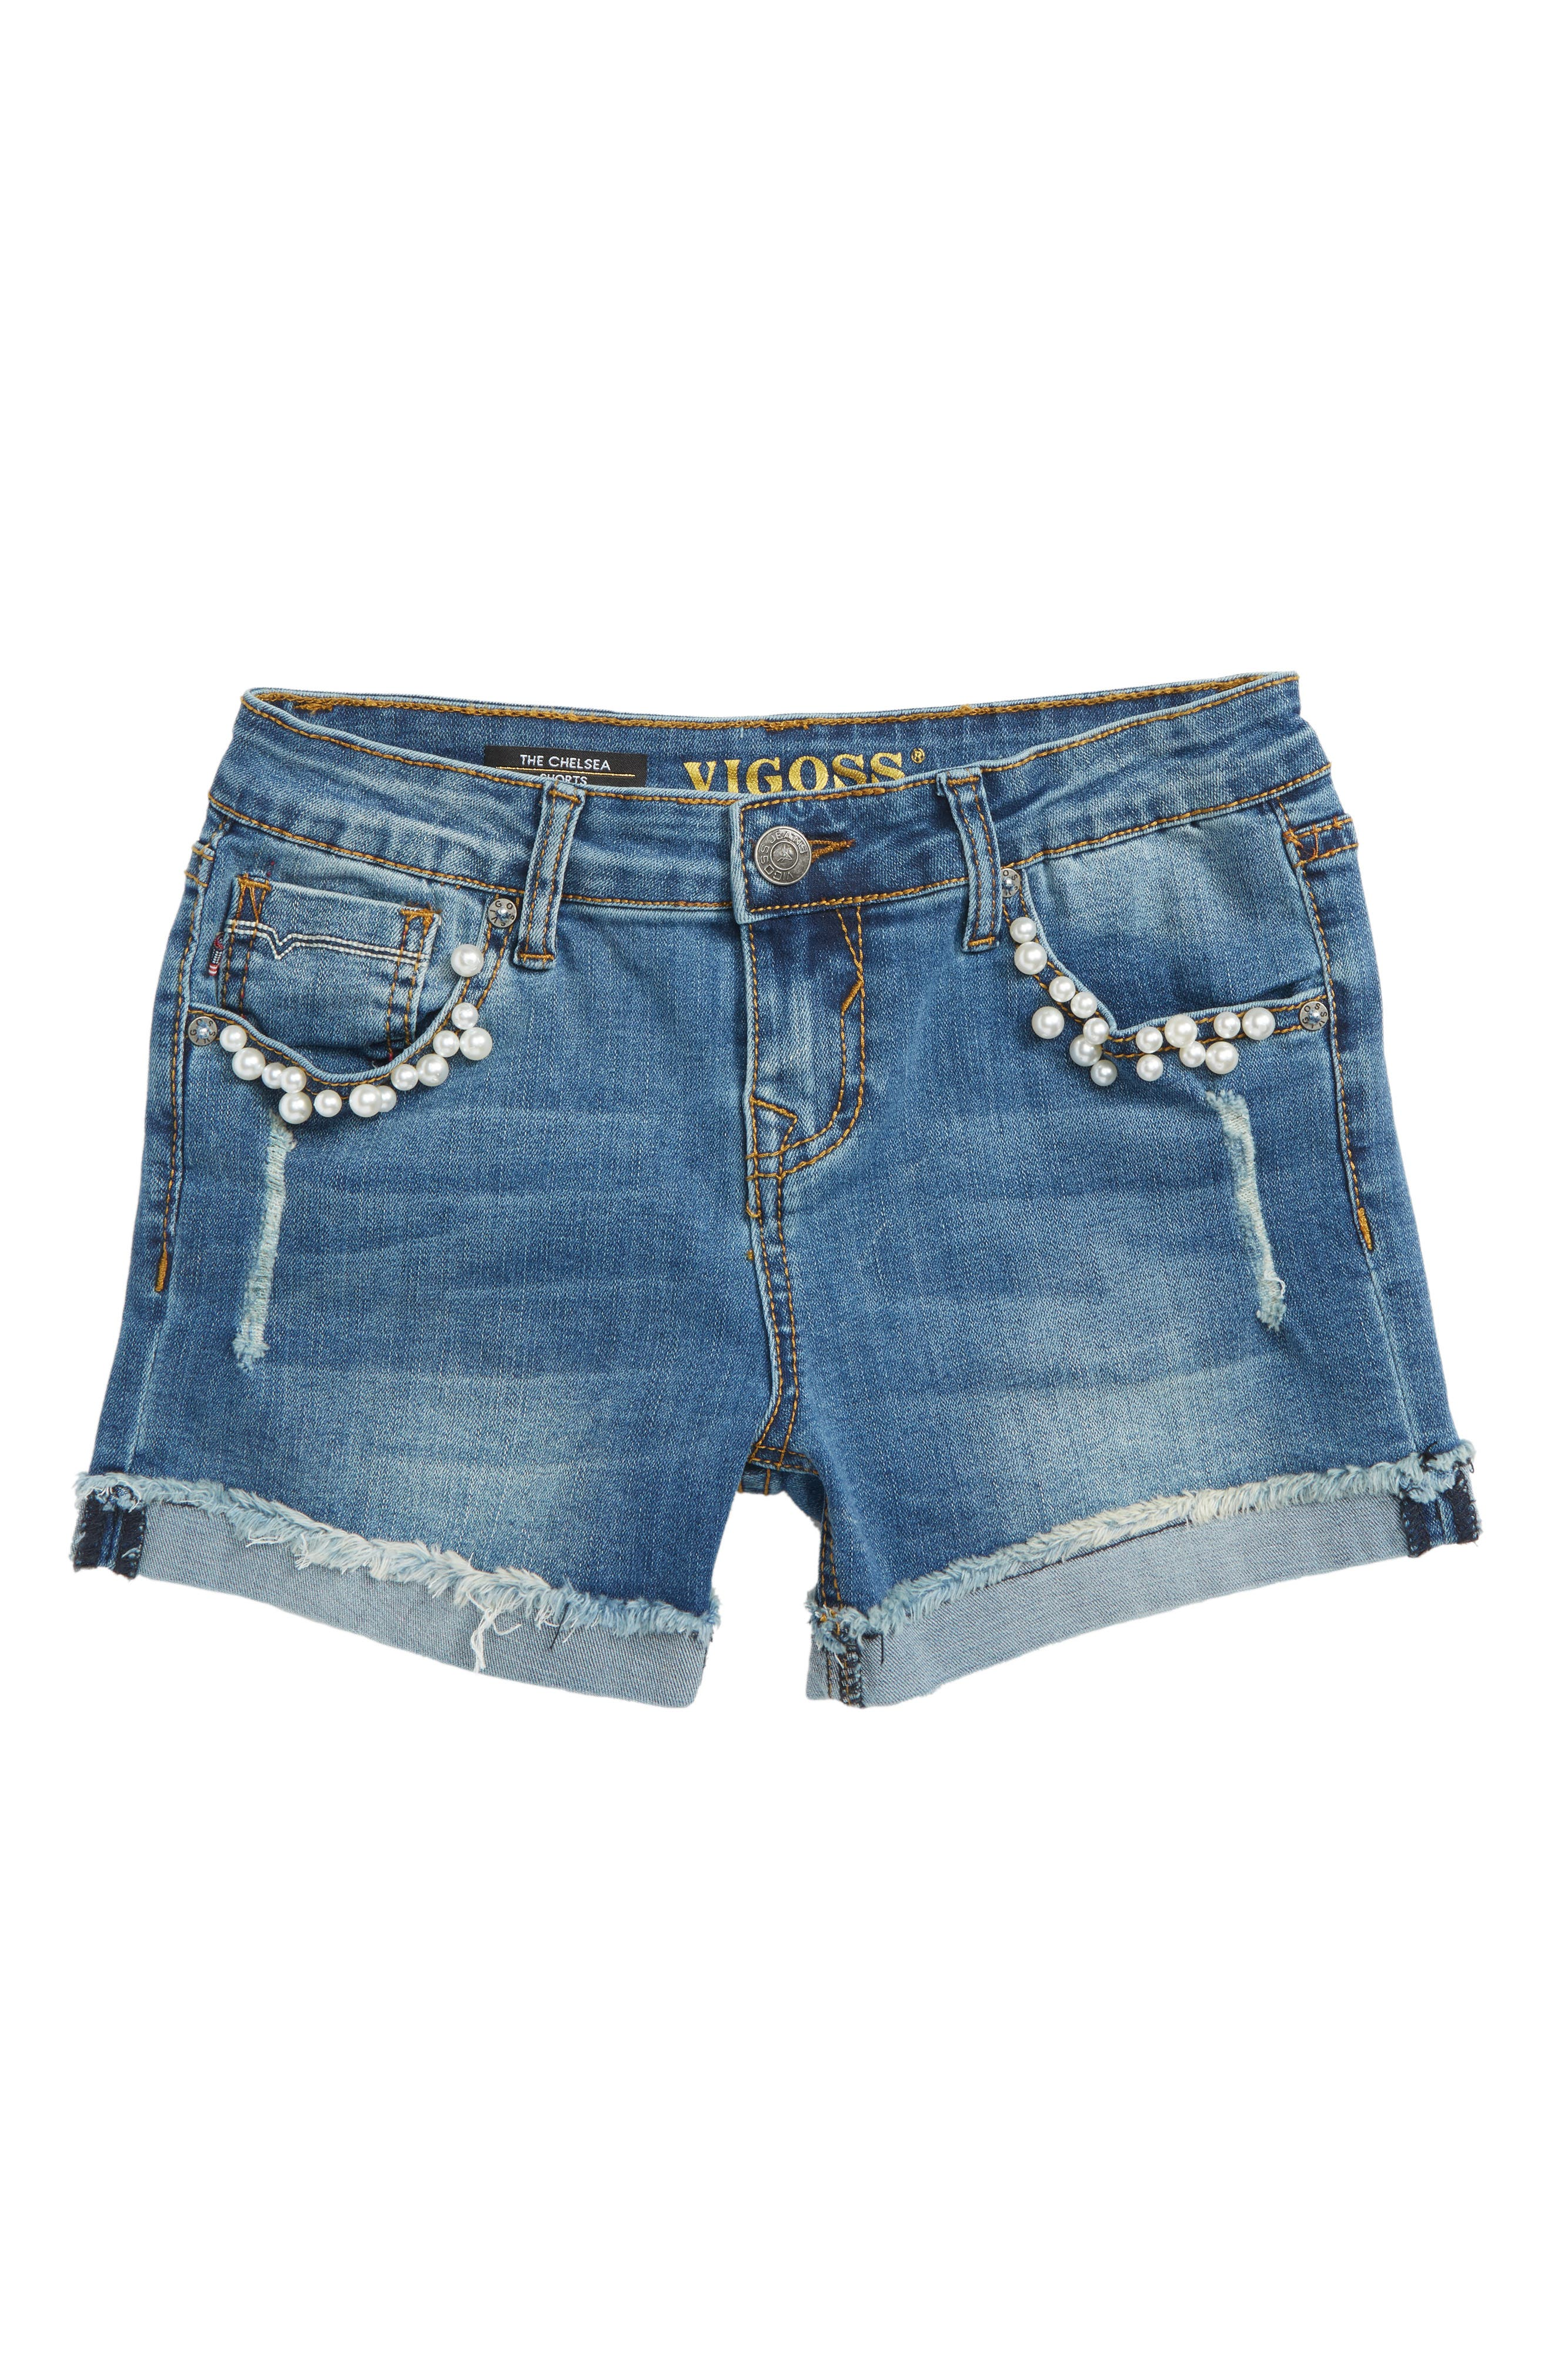 Imitation Pearl Frayed Denim Shorts,                             Main thumbnail 1, color,                             Regal Blue